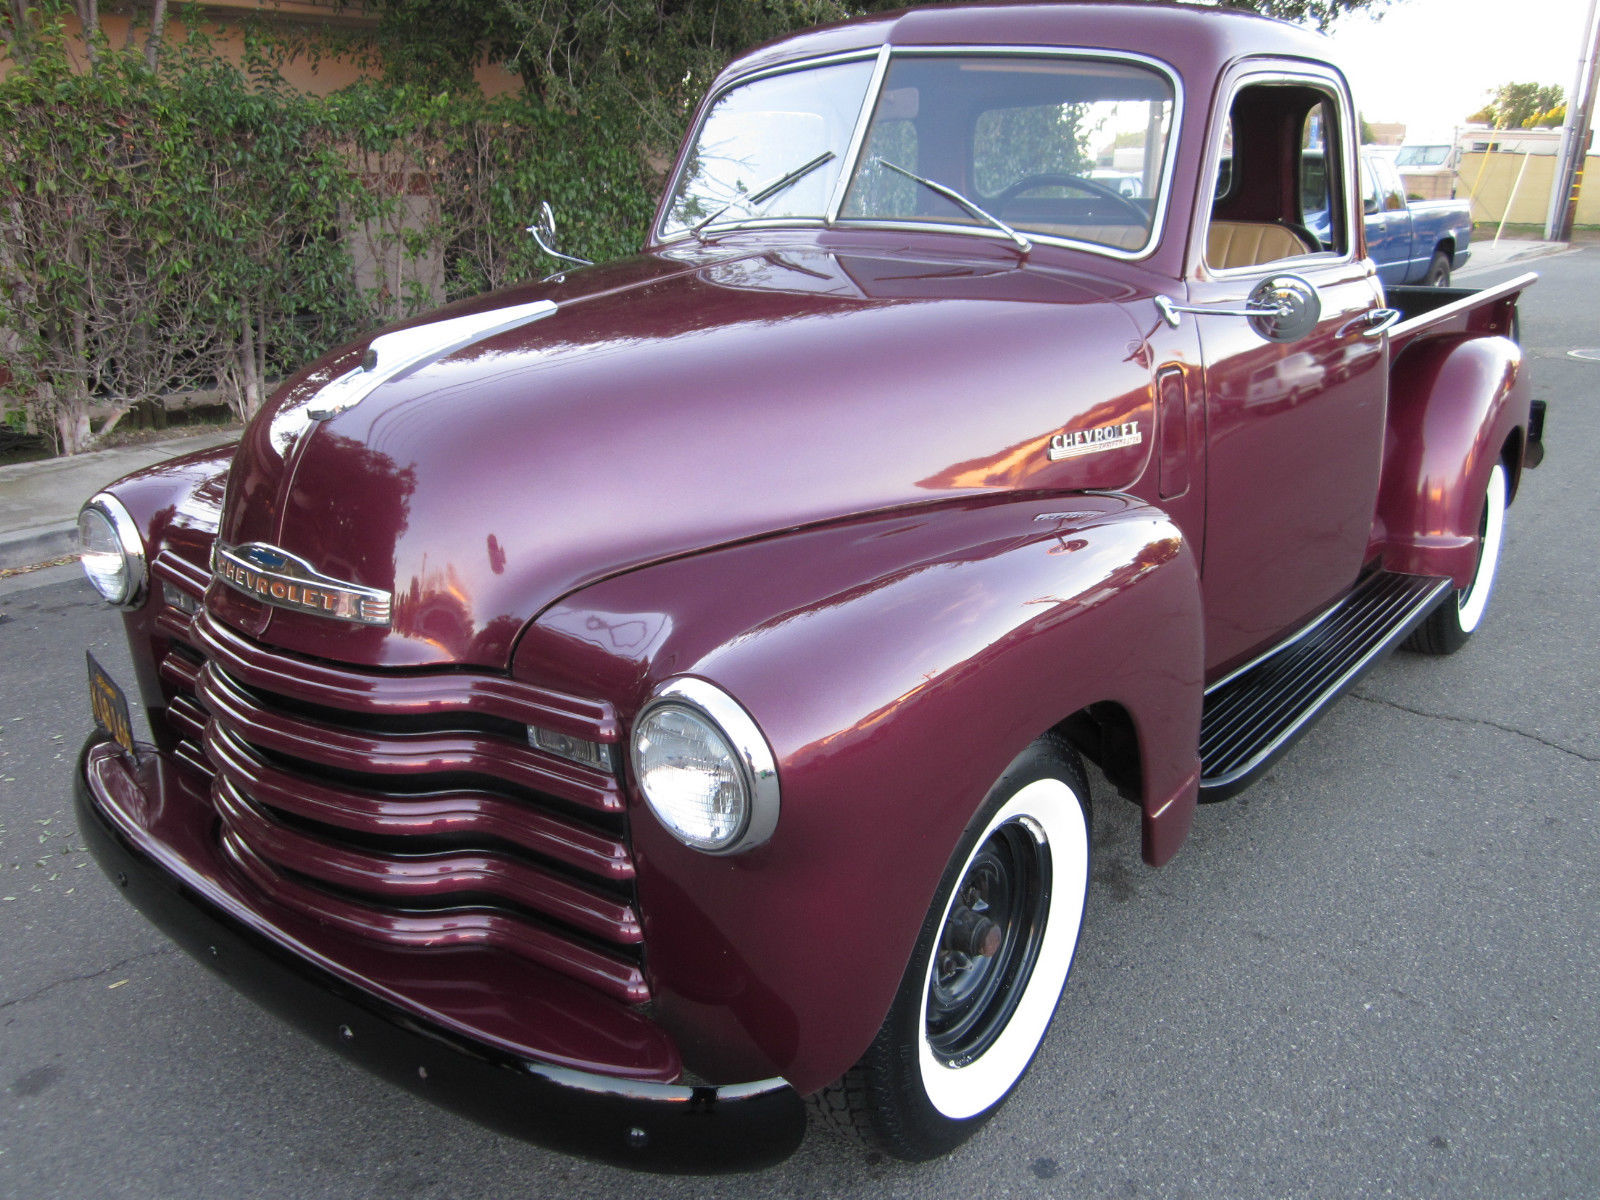 1948 Chevy Pickup Deluxe 5 Window Cab Original No Rust